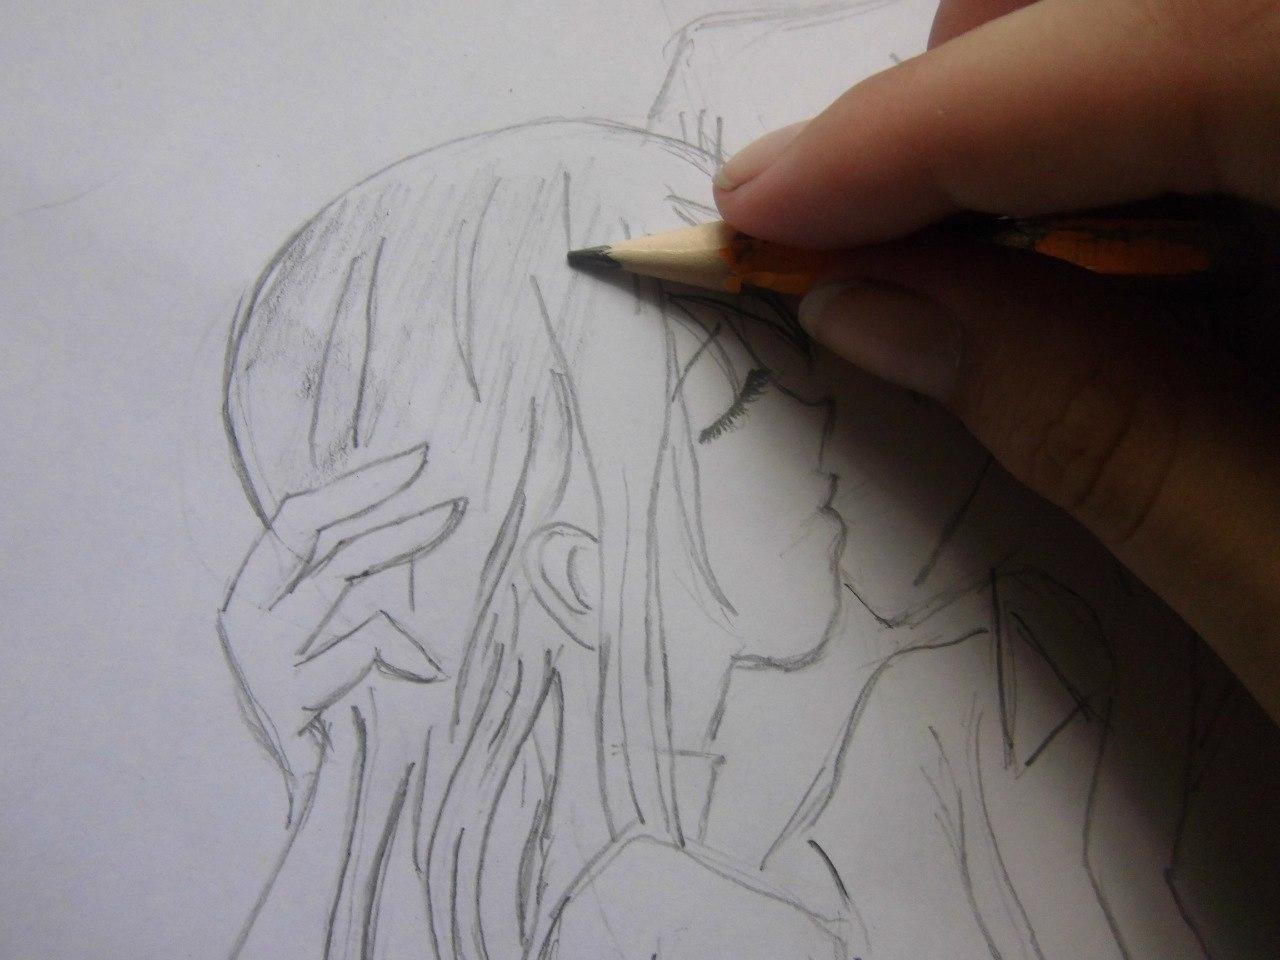 urok_risovanie_karandashom_celuyushhiesya_anime_pary-step-4 Как нарисовать пару из Вокалоидов карандашом поэтапно